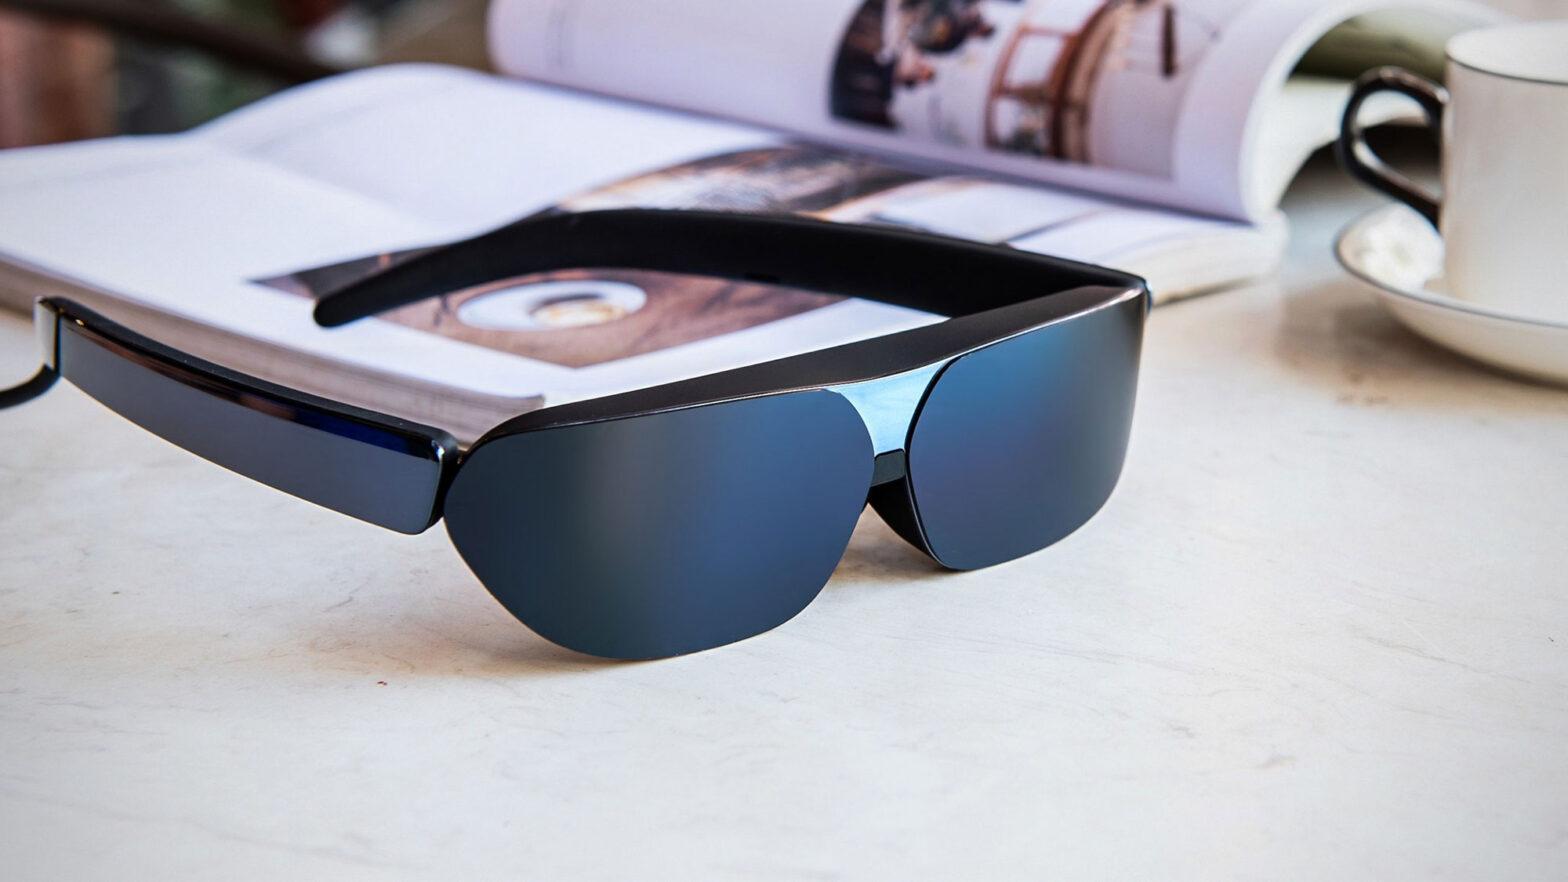 TCL NXTWEAR G Smart Glasses MWC 2021